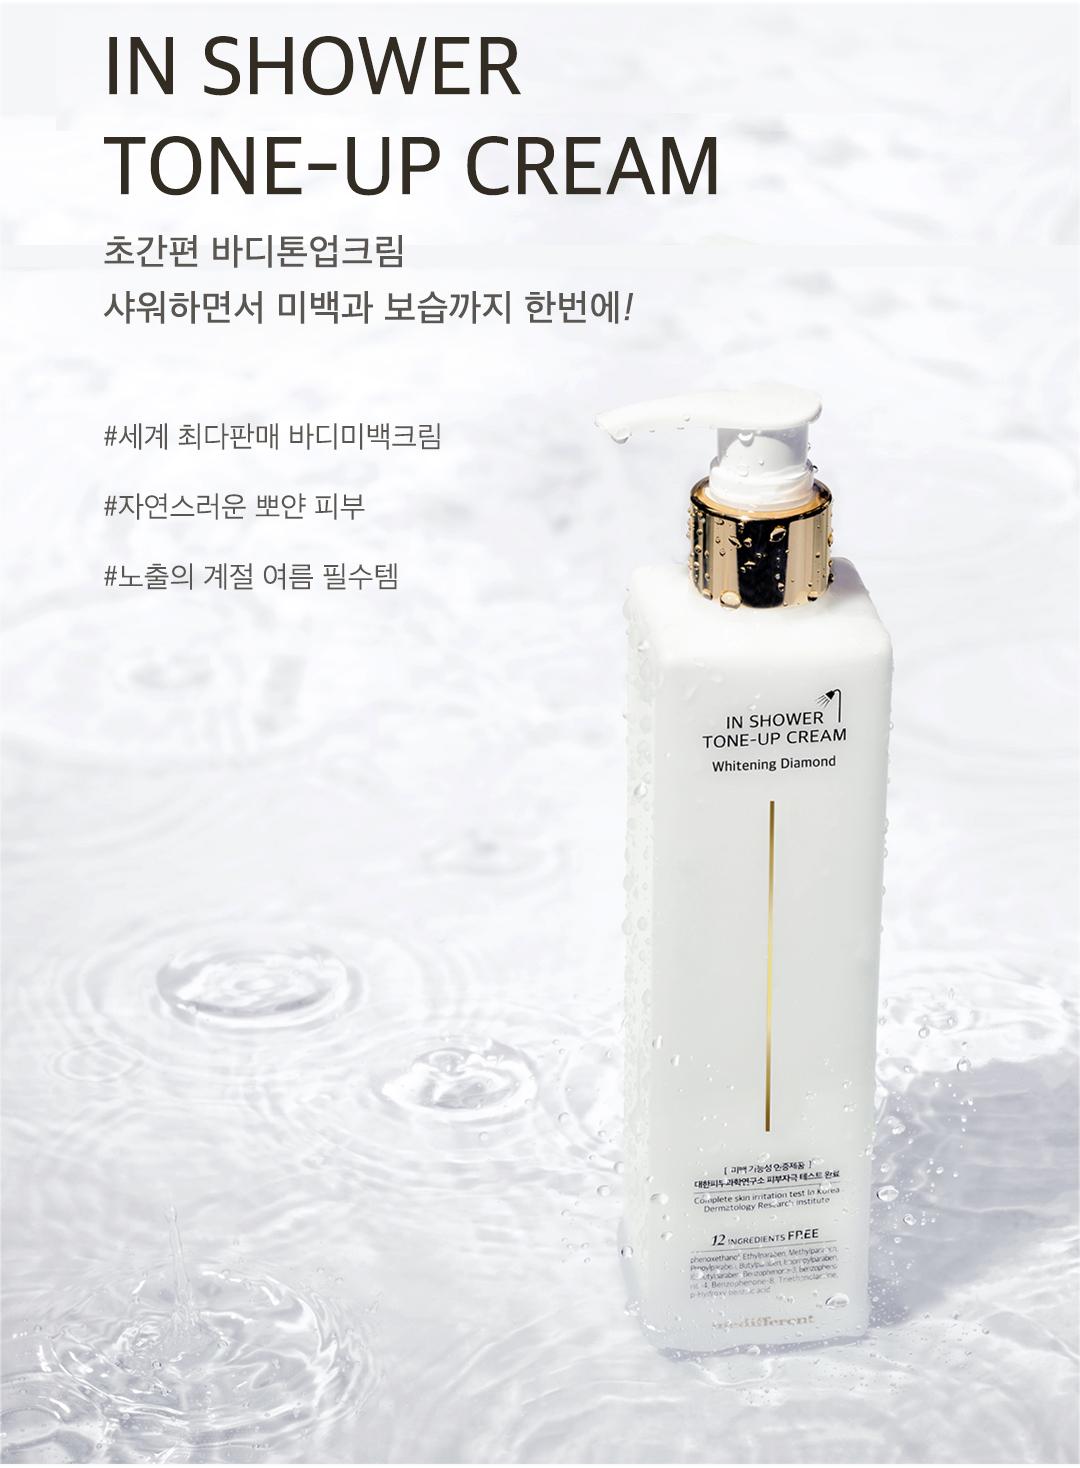 Sữa Tắm Medifferent In Shower Tone-Up Cream Whitening Diamond